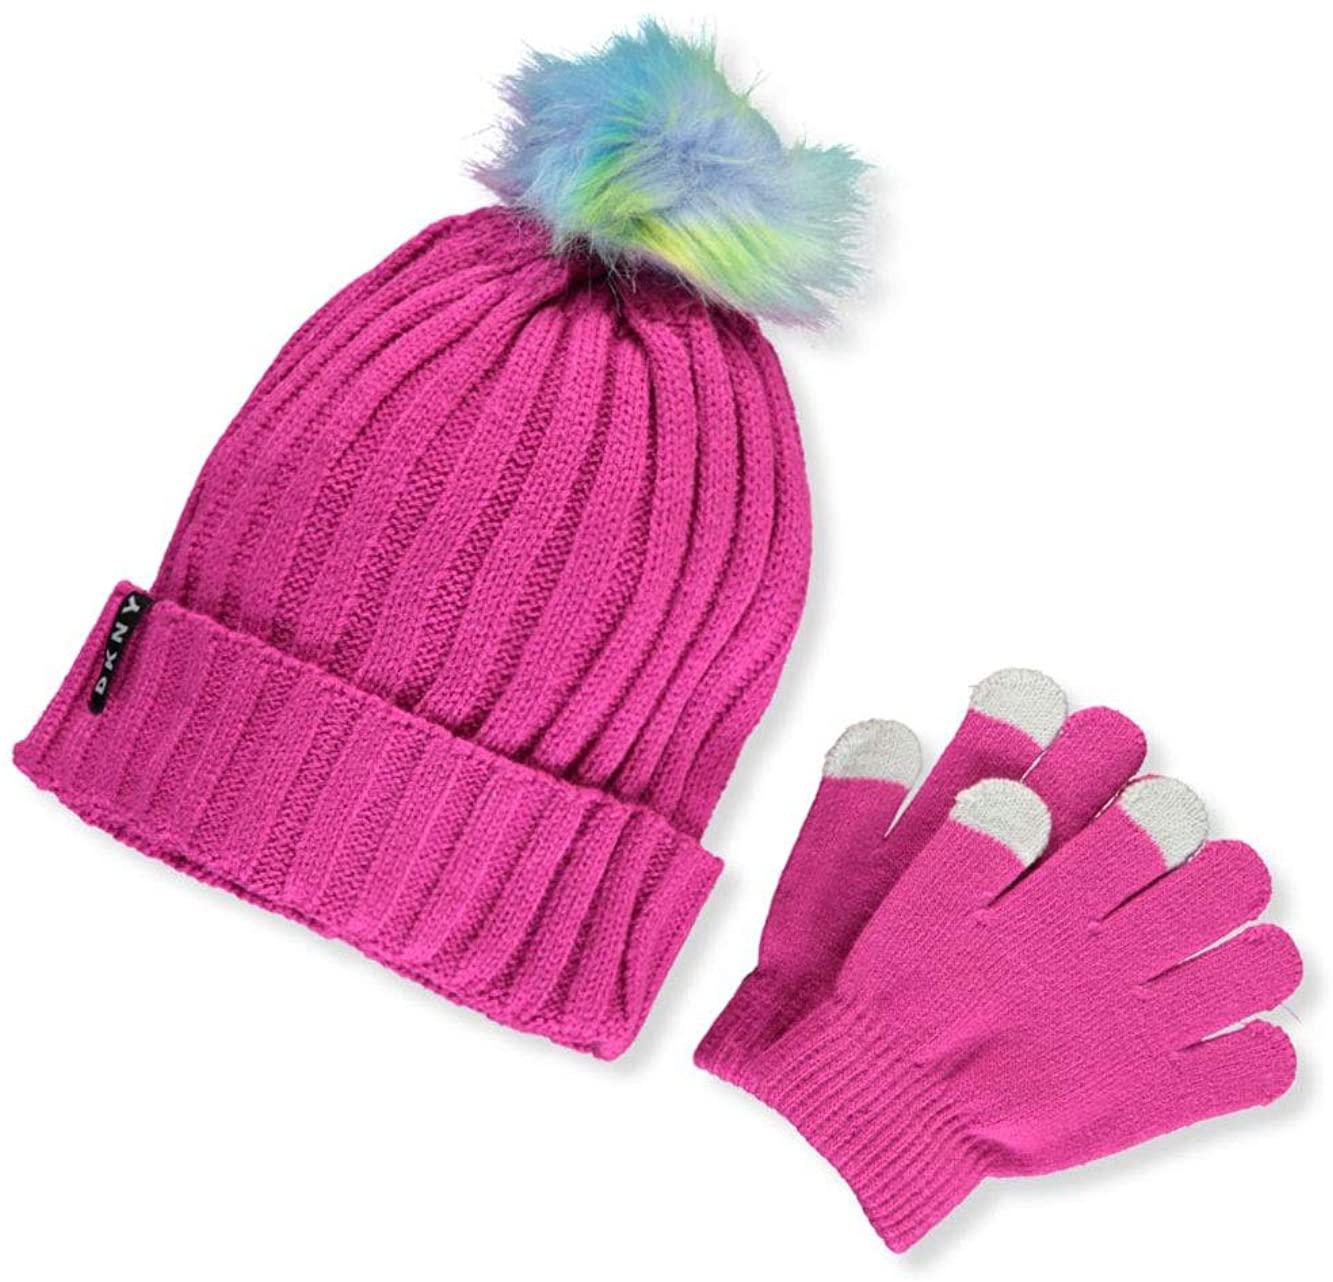 DKNY Girls' Knit Hat & Tech Touch Gloves Set